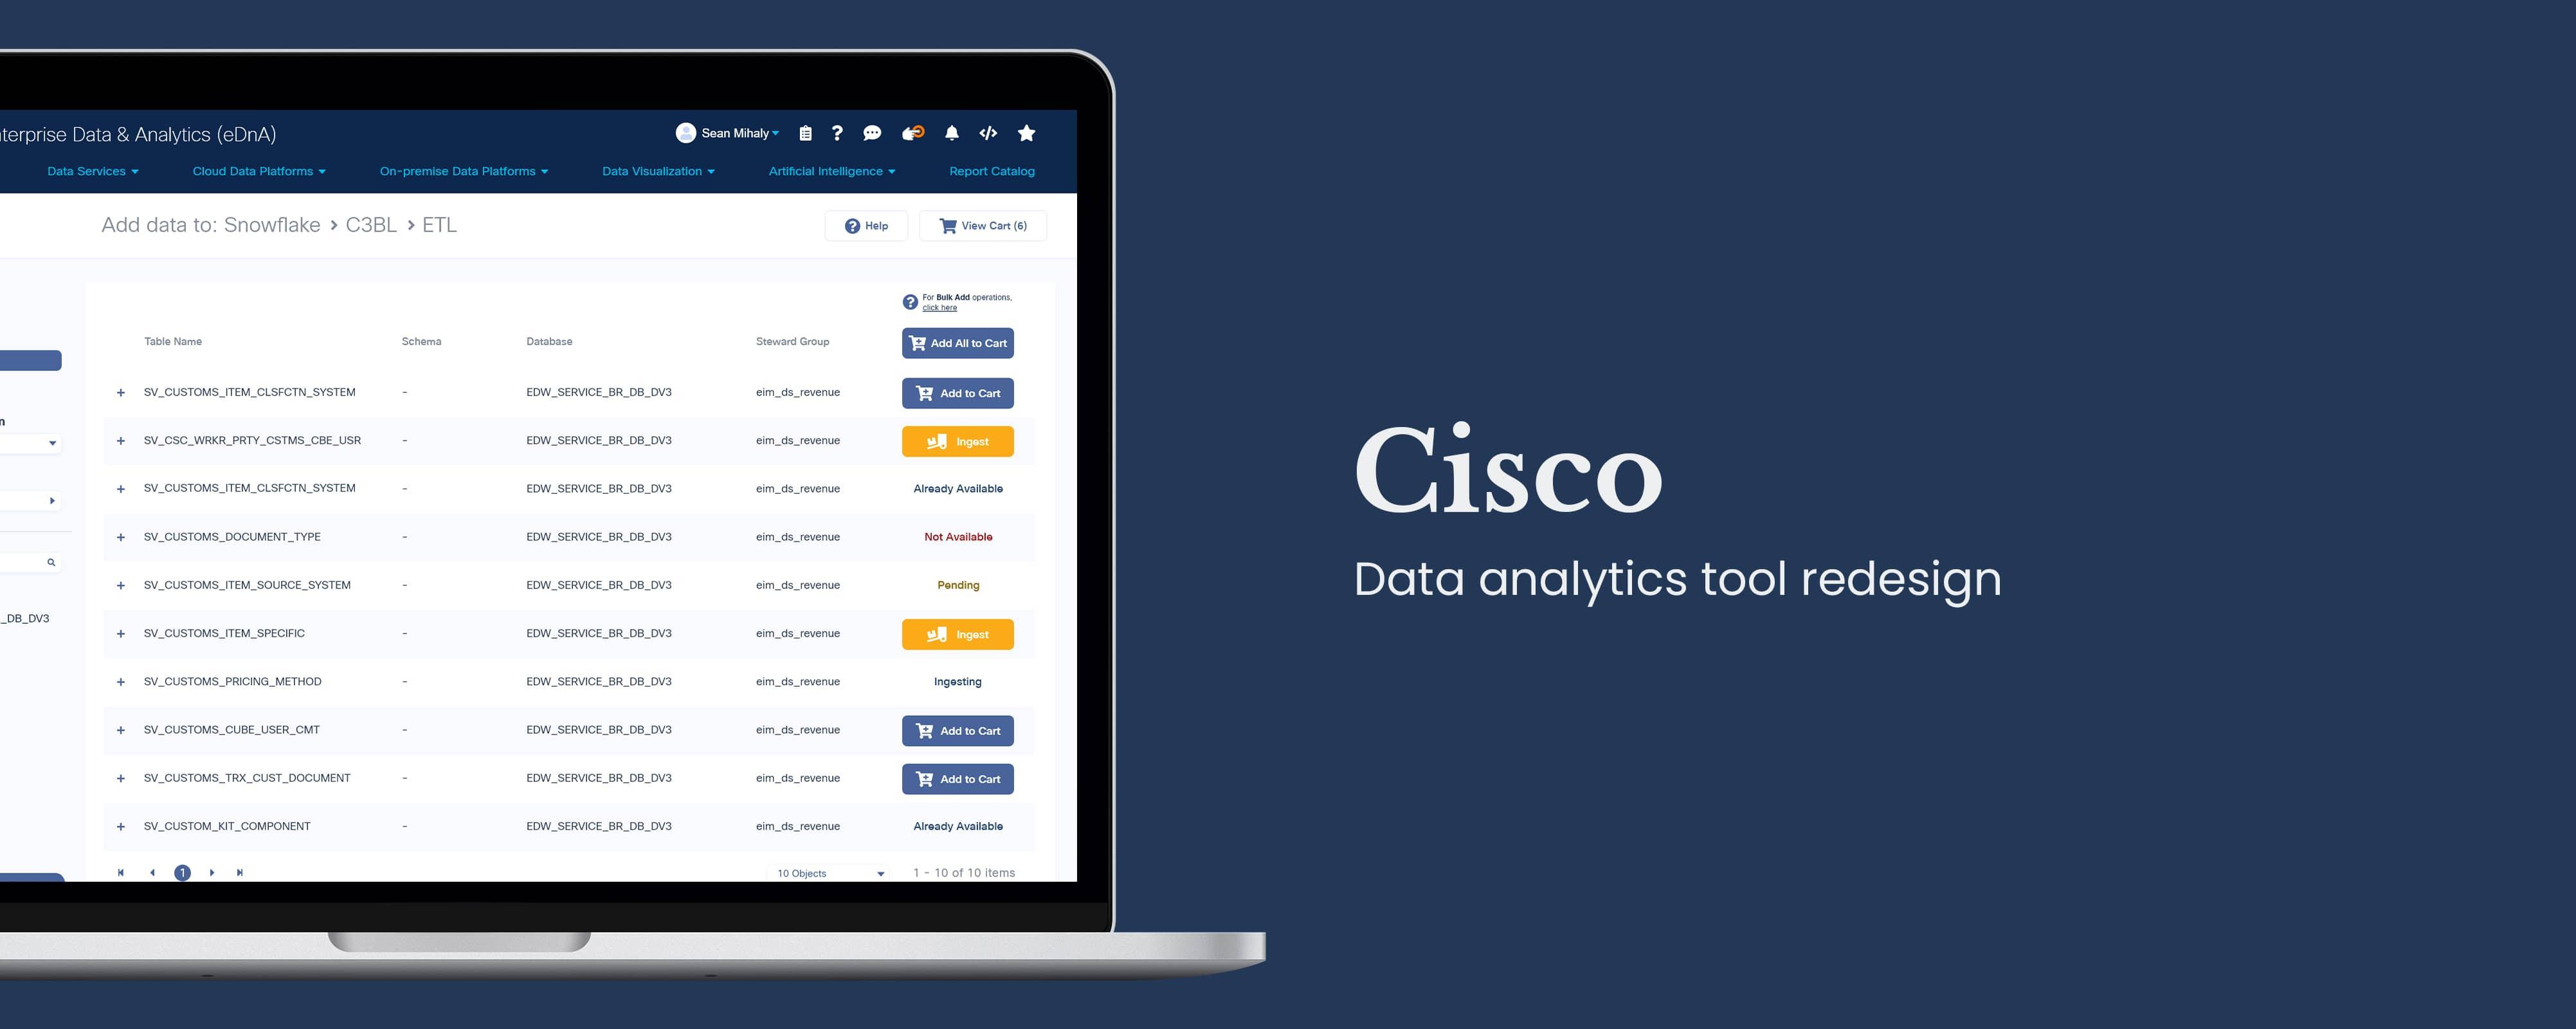 Cisco: Data analytics tool redesign